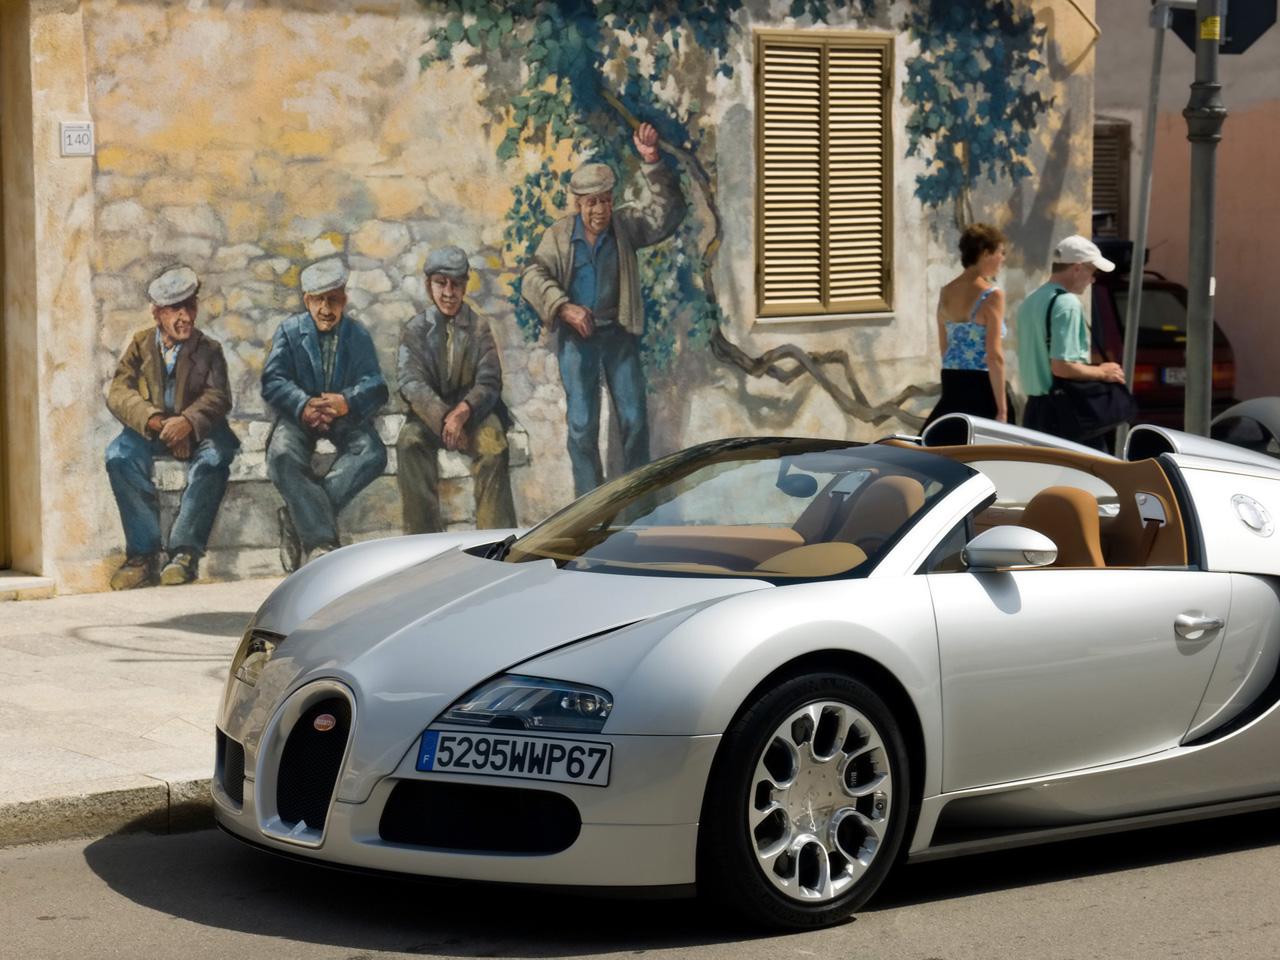 Bugatti Veyron Grand Sport Sardinia